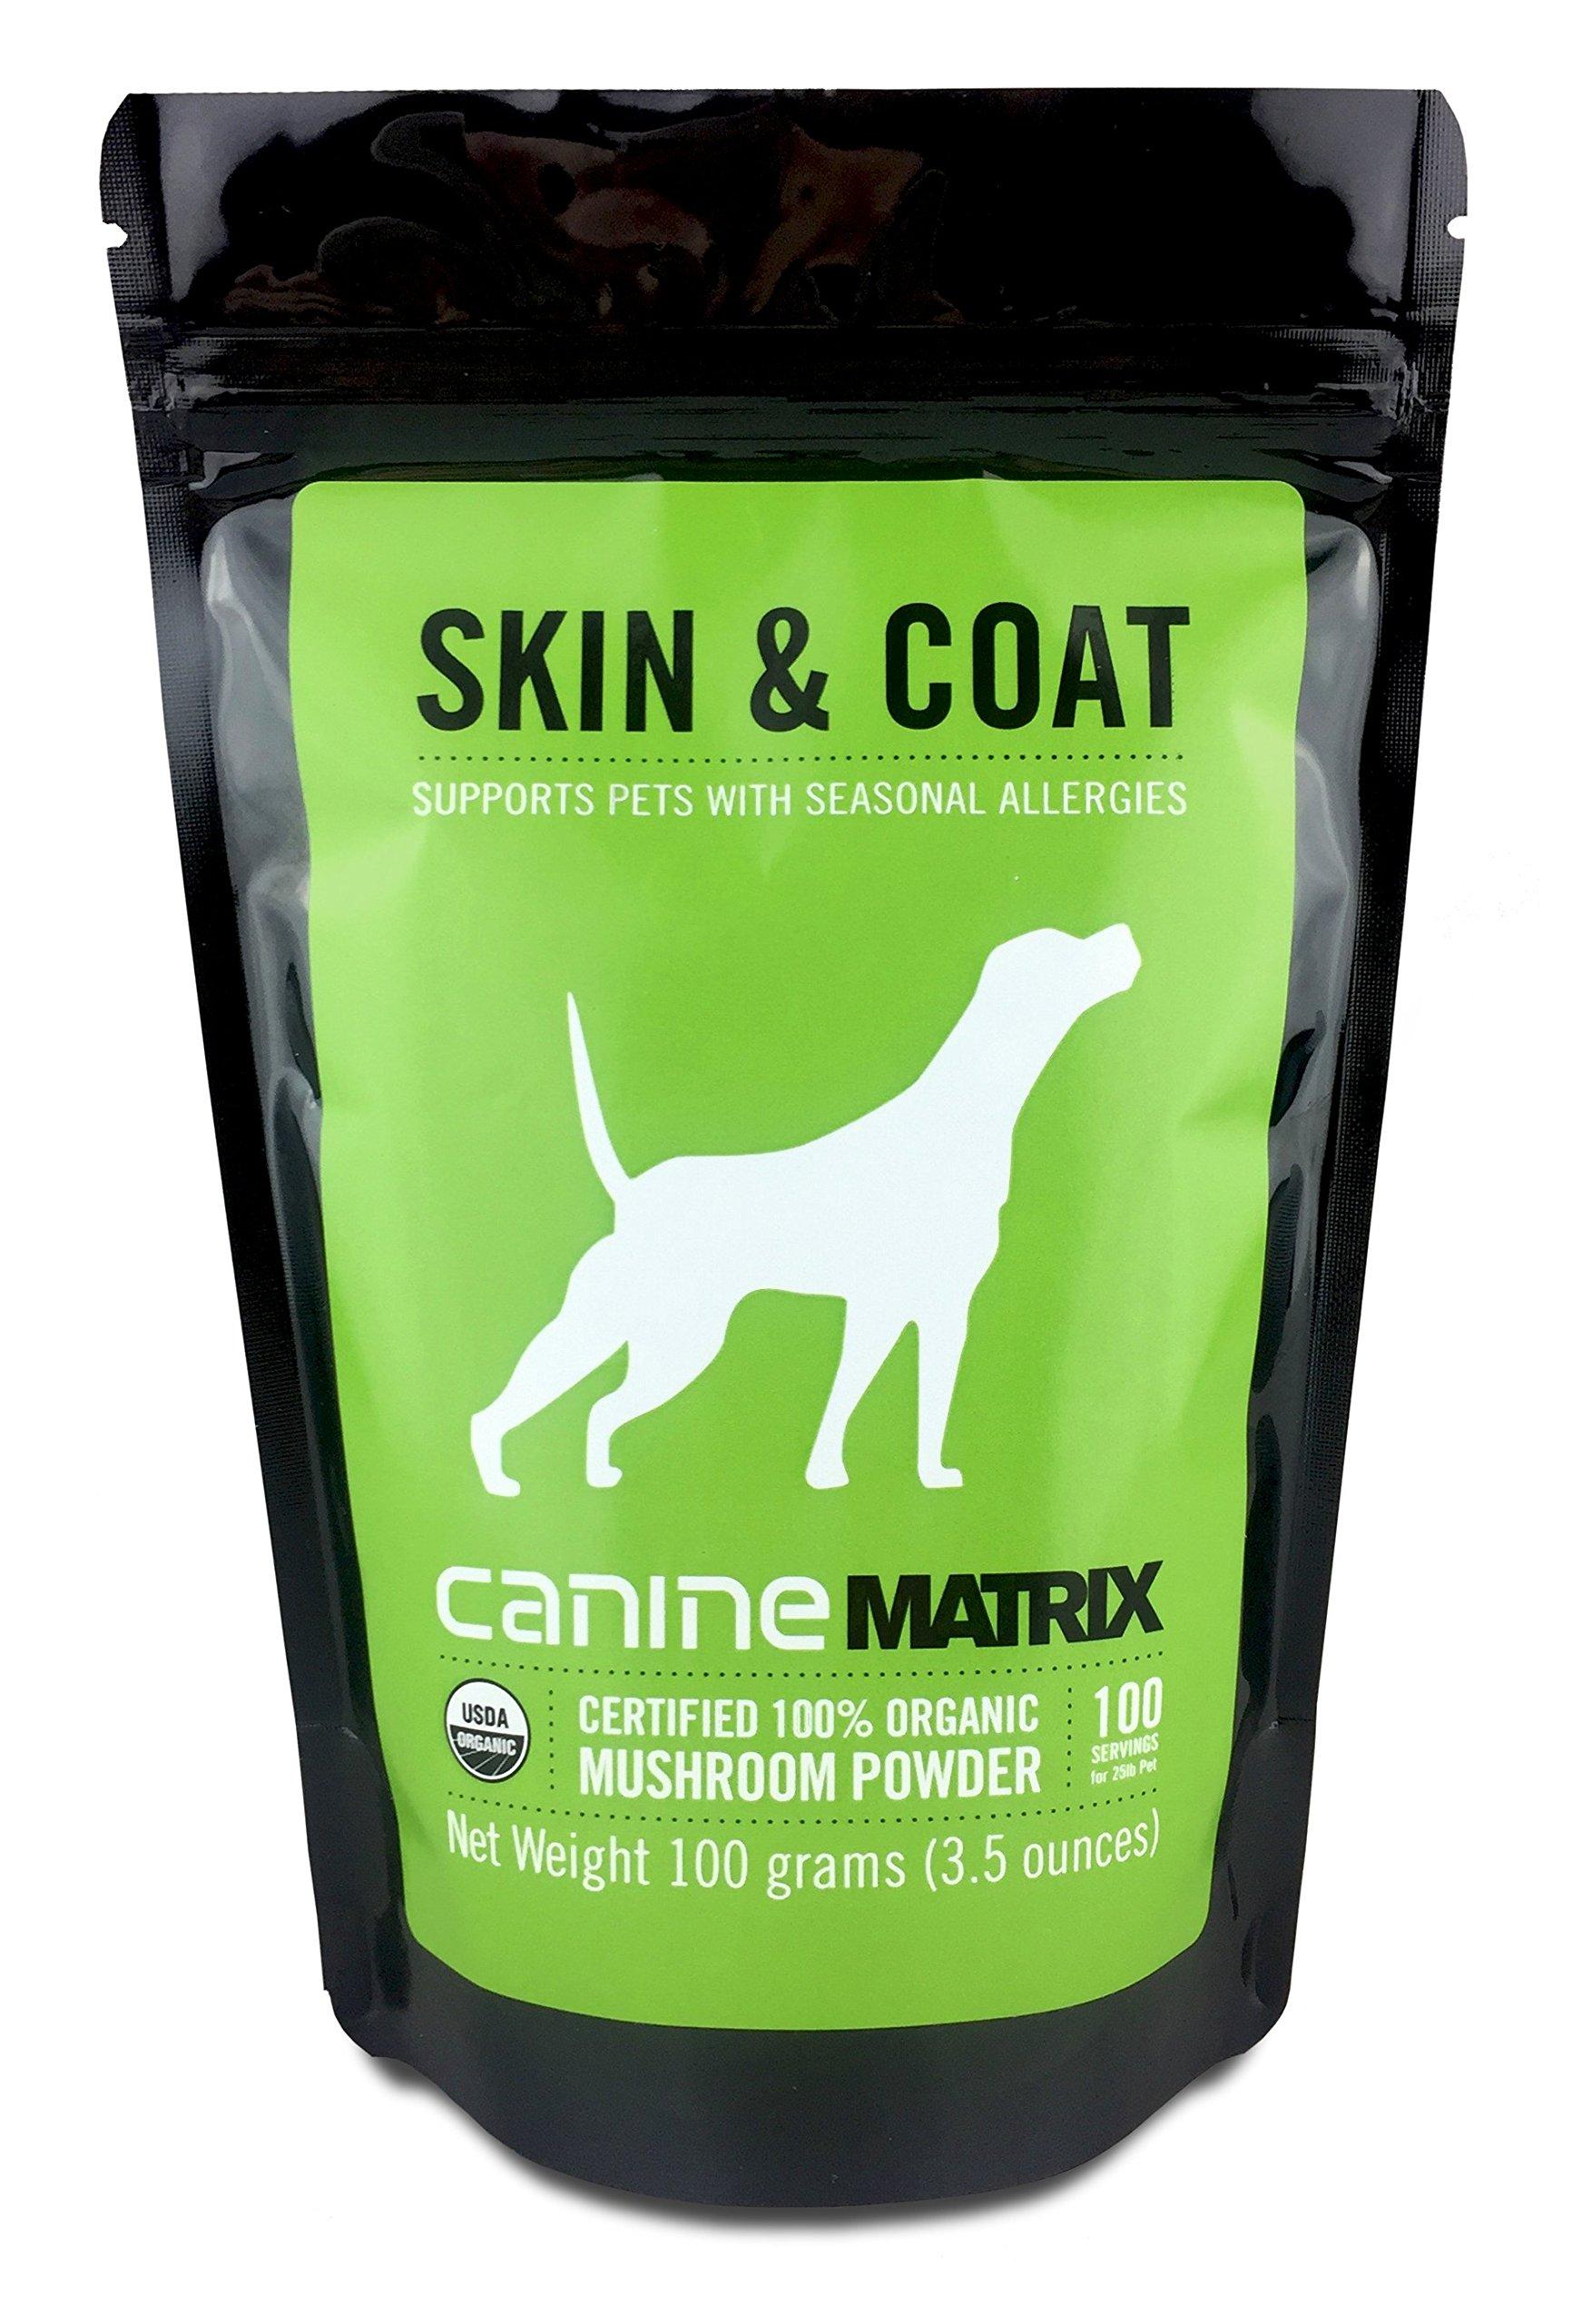 Canine Matrix Organic Mushroom Supplement for Dogs, Skin & Coat, 100 gm